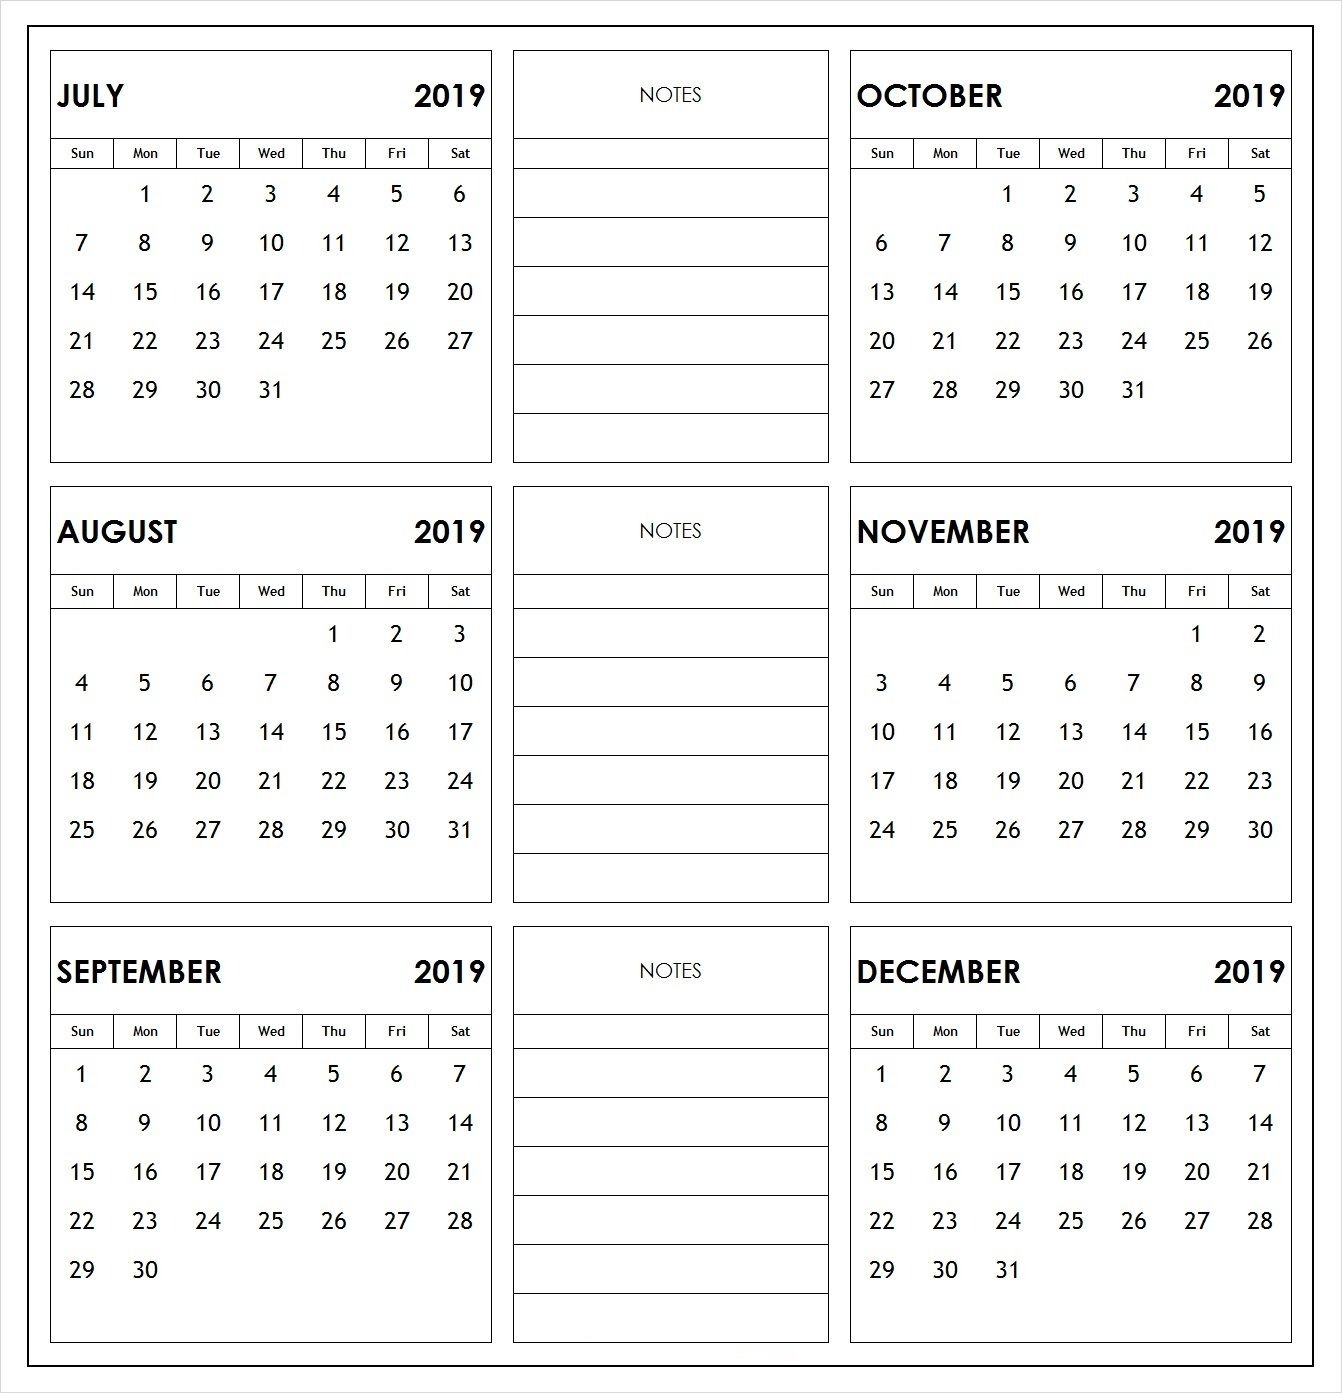 8 Month Calendar 2019 Dec To Jul